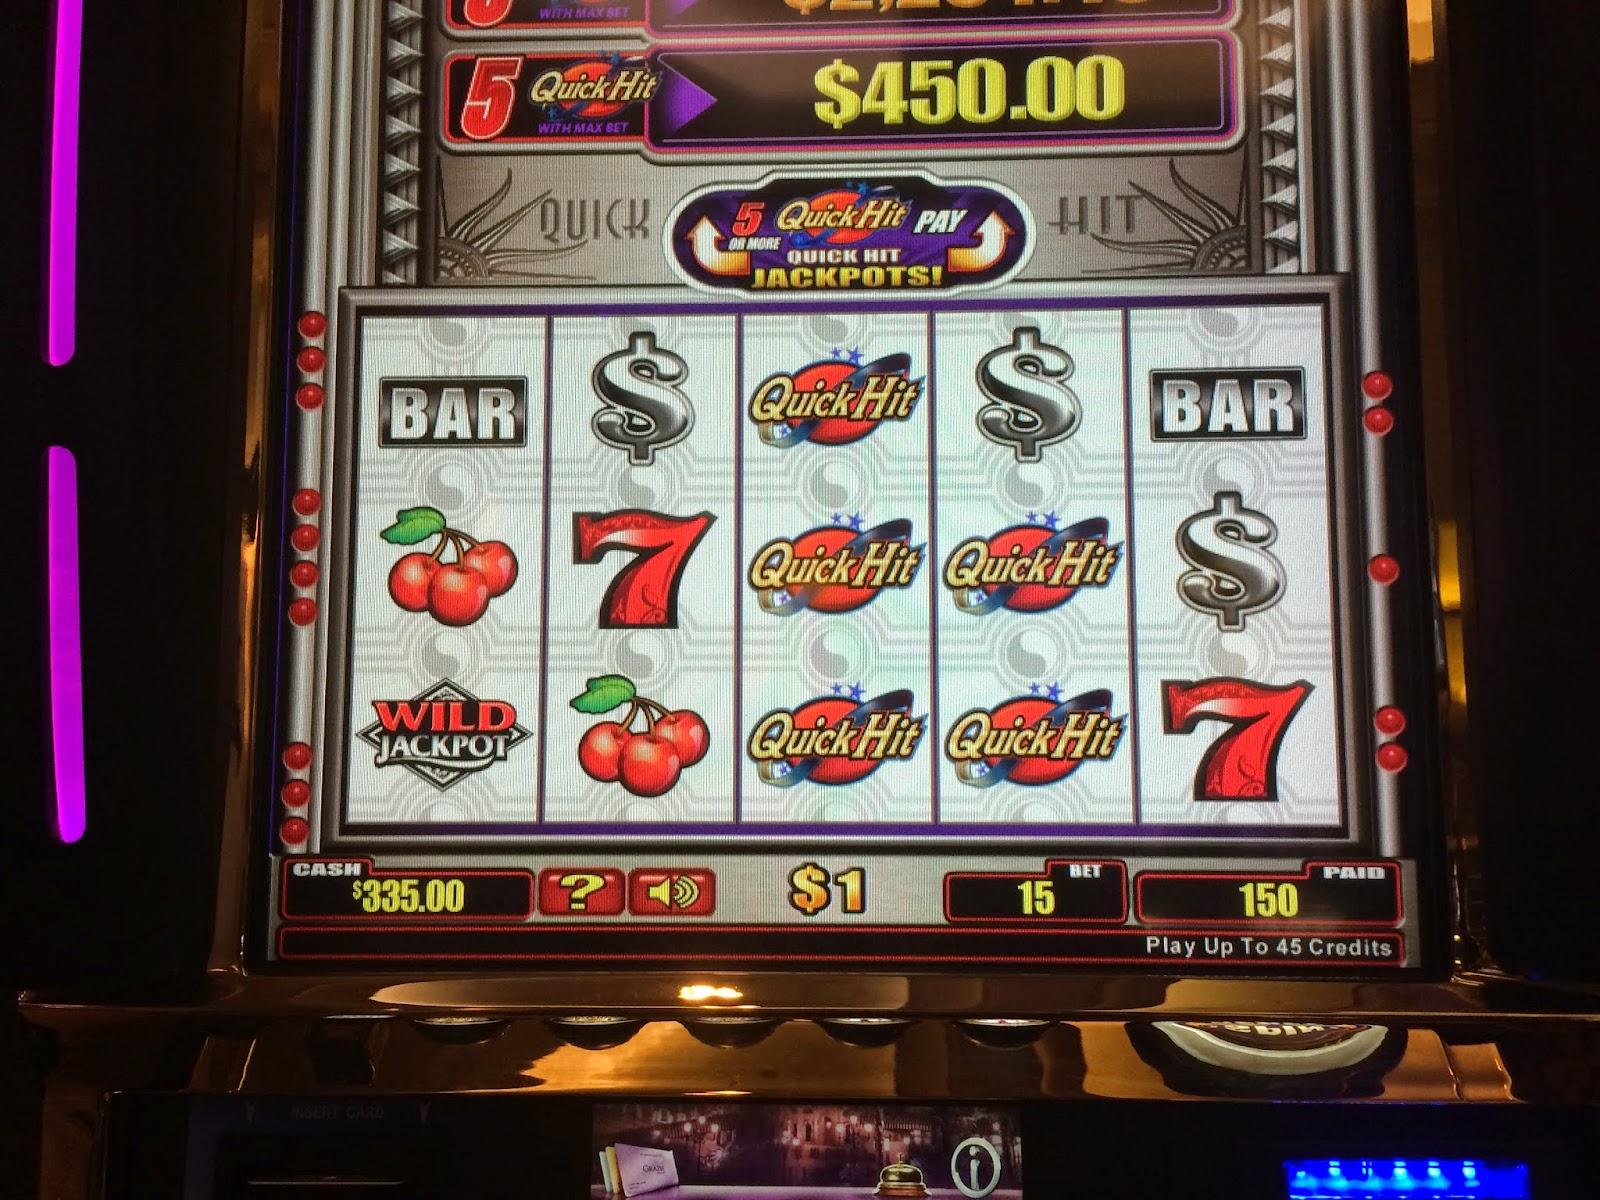 Quick hit dollar slot machine